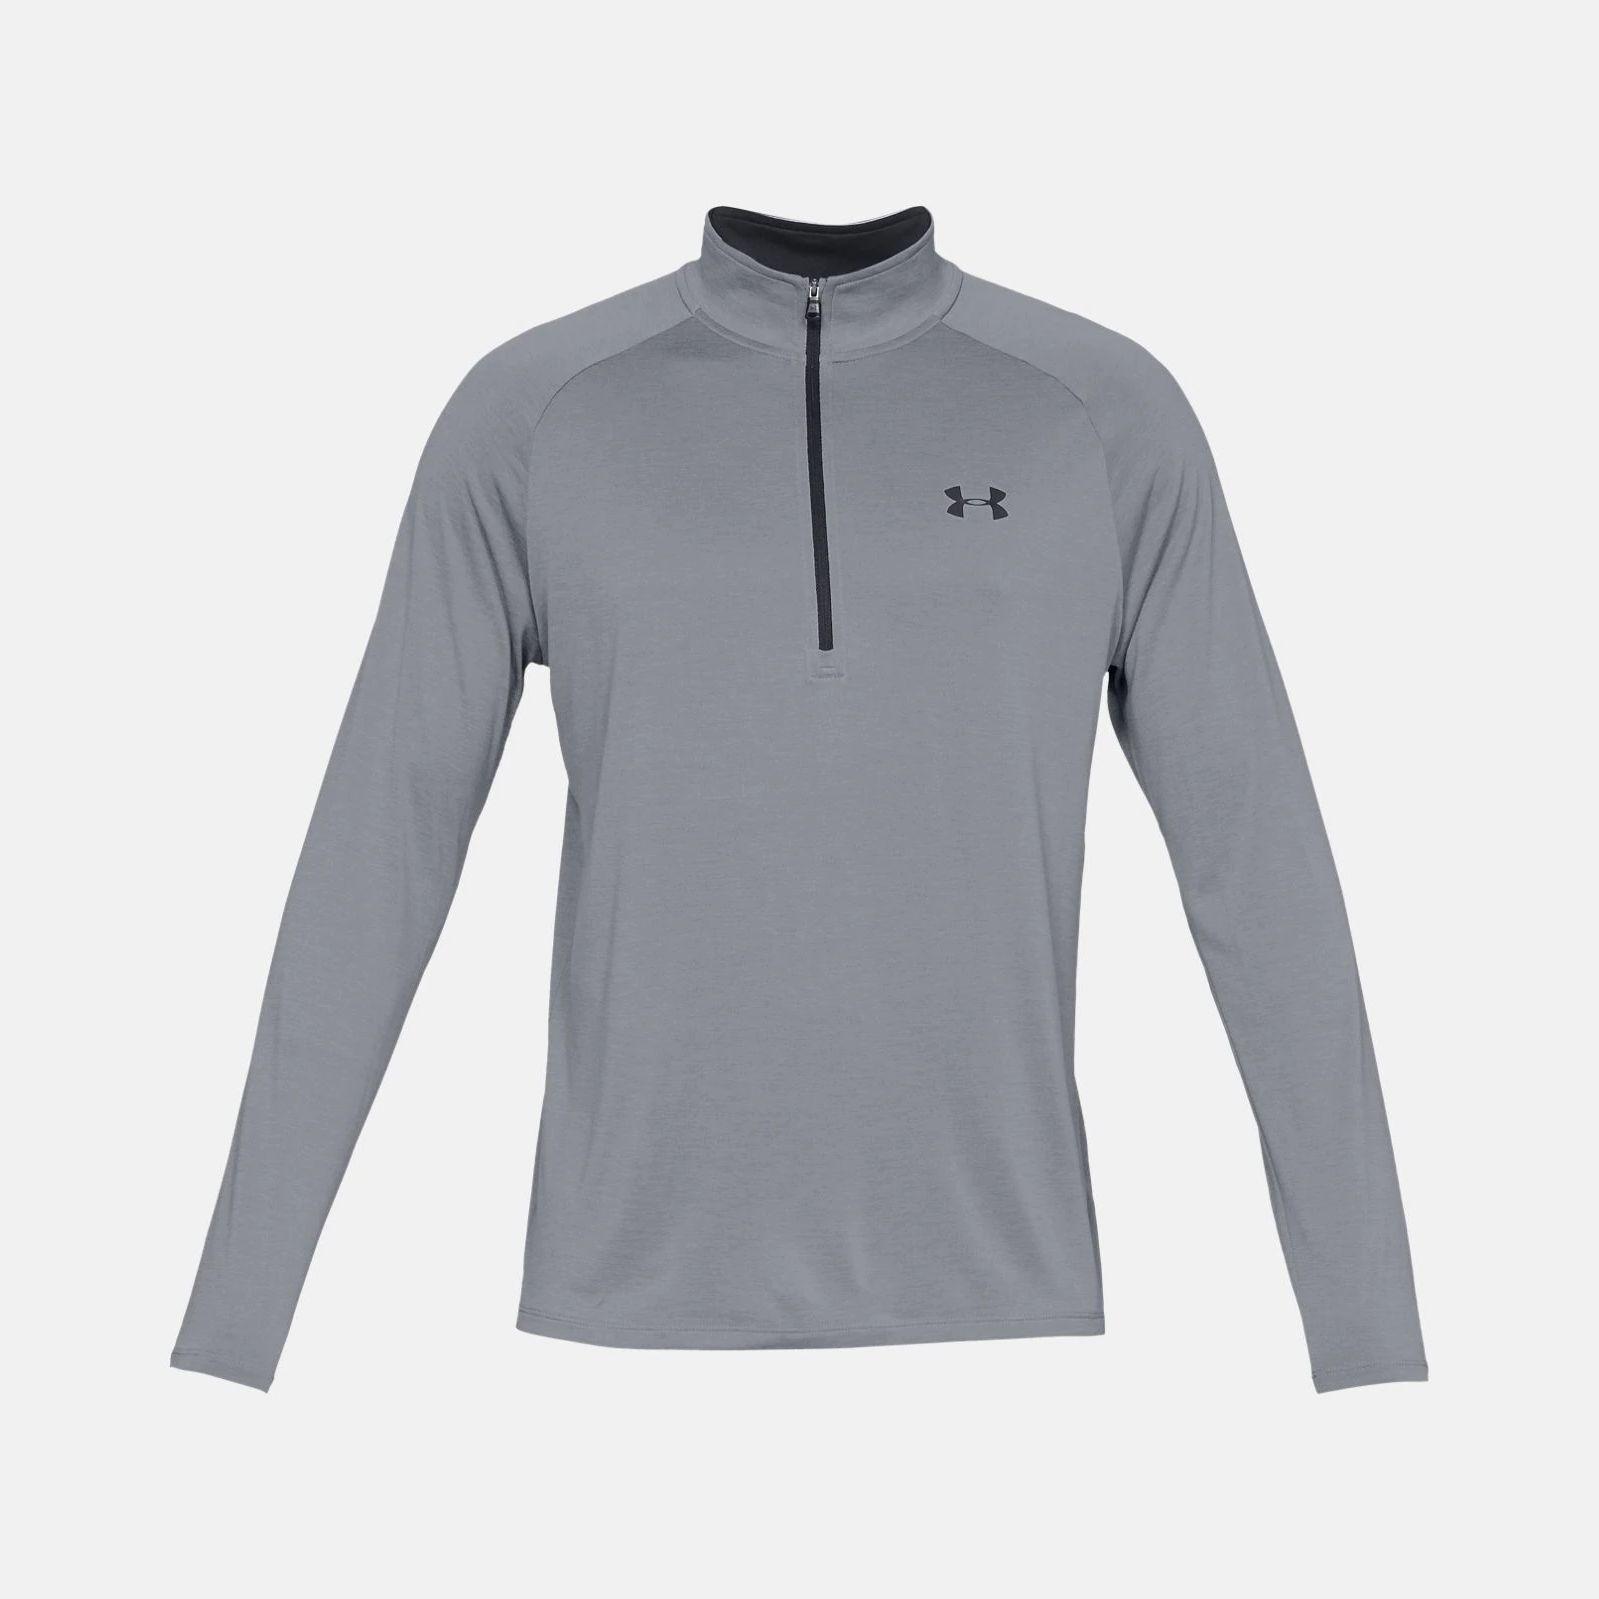 Clothing -  under armour UA Tech 1/2 Zip Long Sleeve 8495